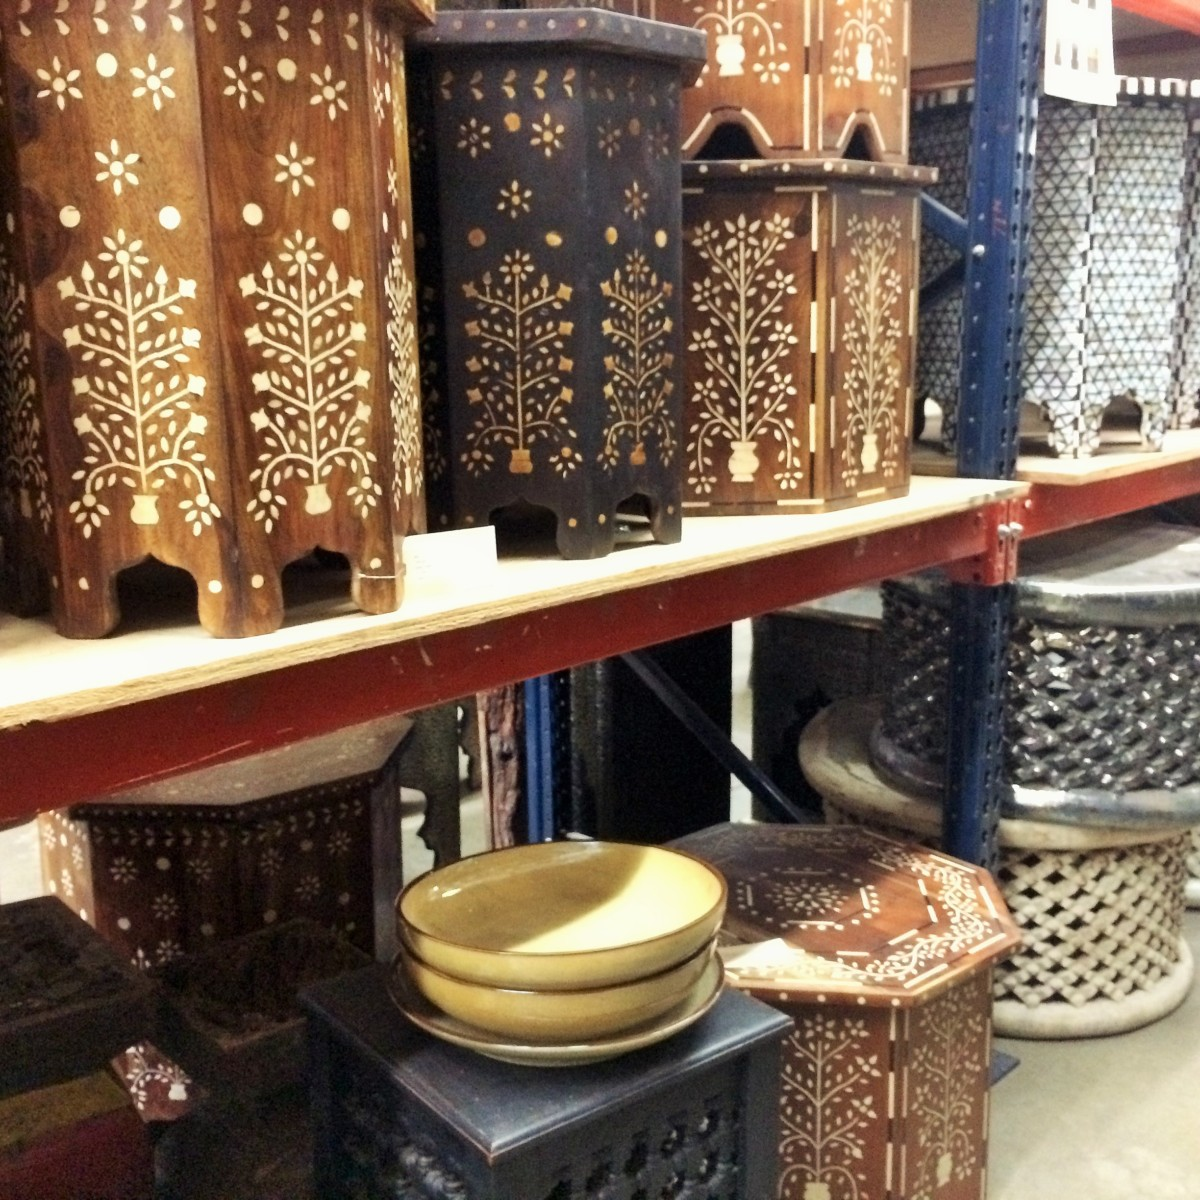 Shopping Home Decor: Home Decor Shopping, Berbere World Imports